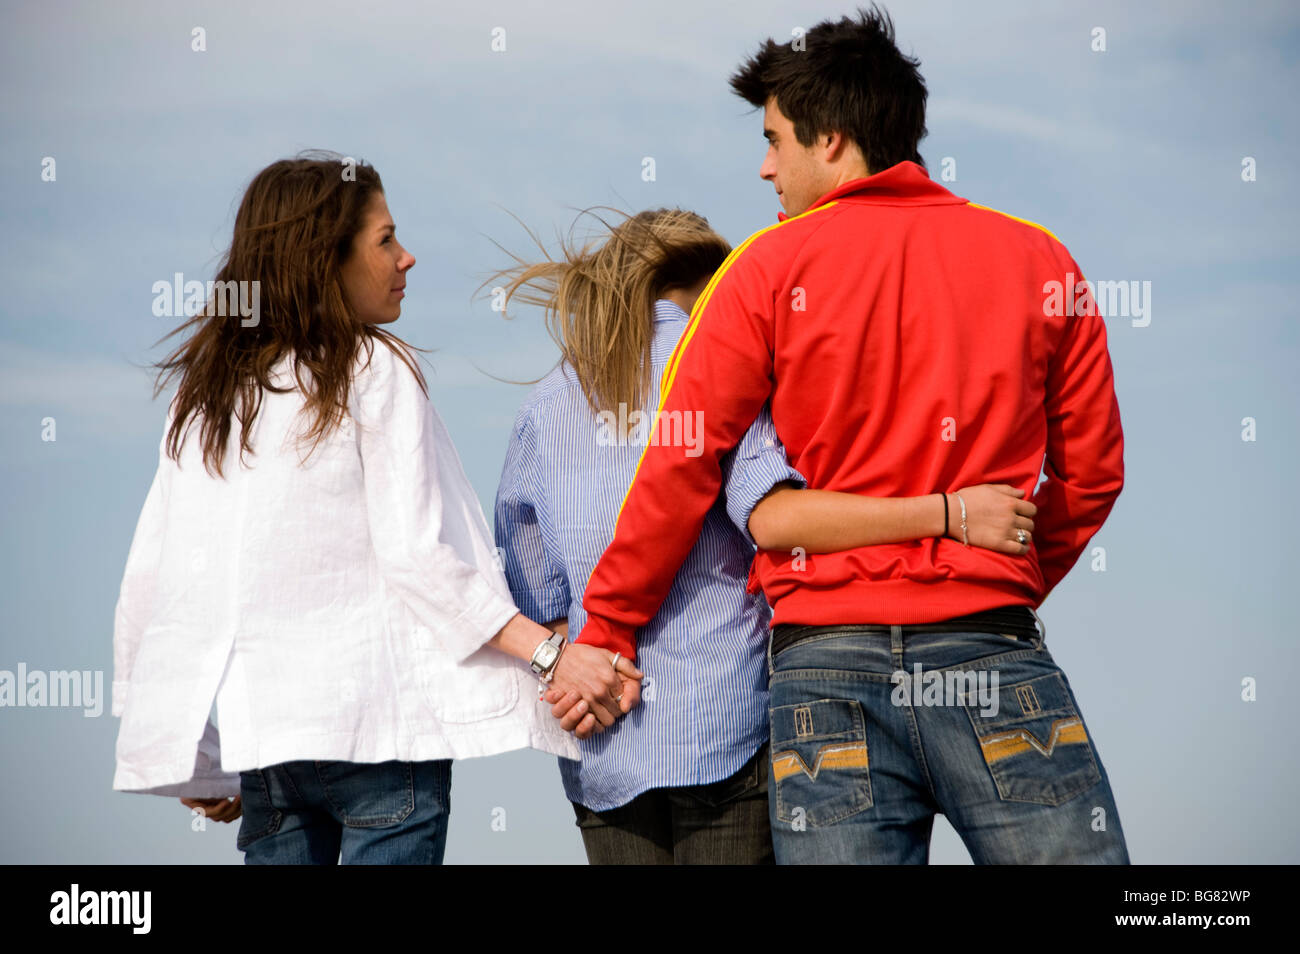 love triangle jealous girl stock photos & love triangle jealous girl